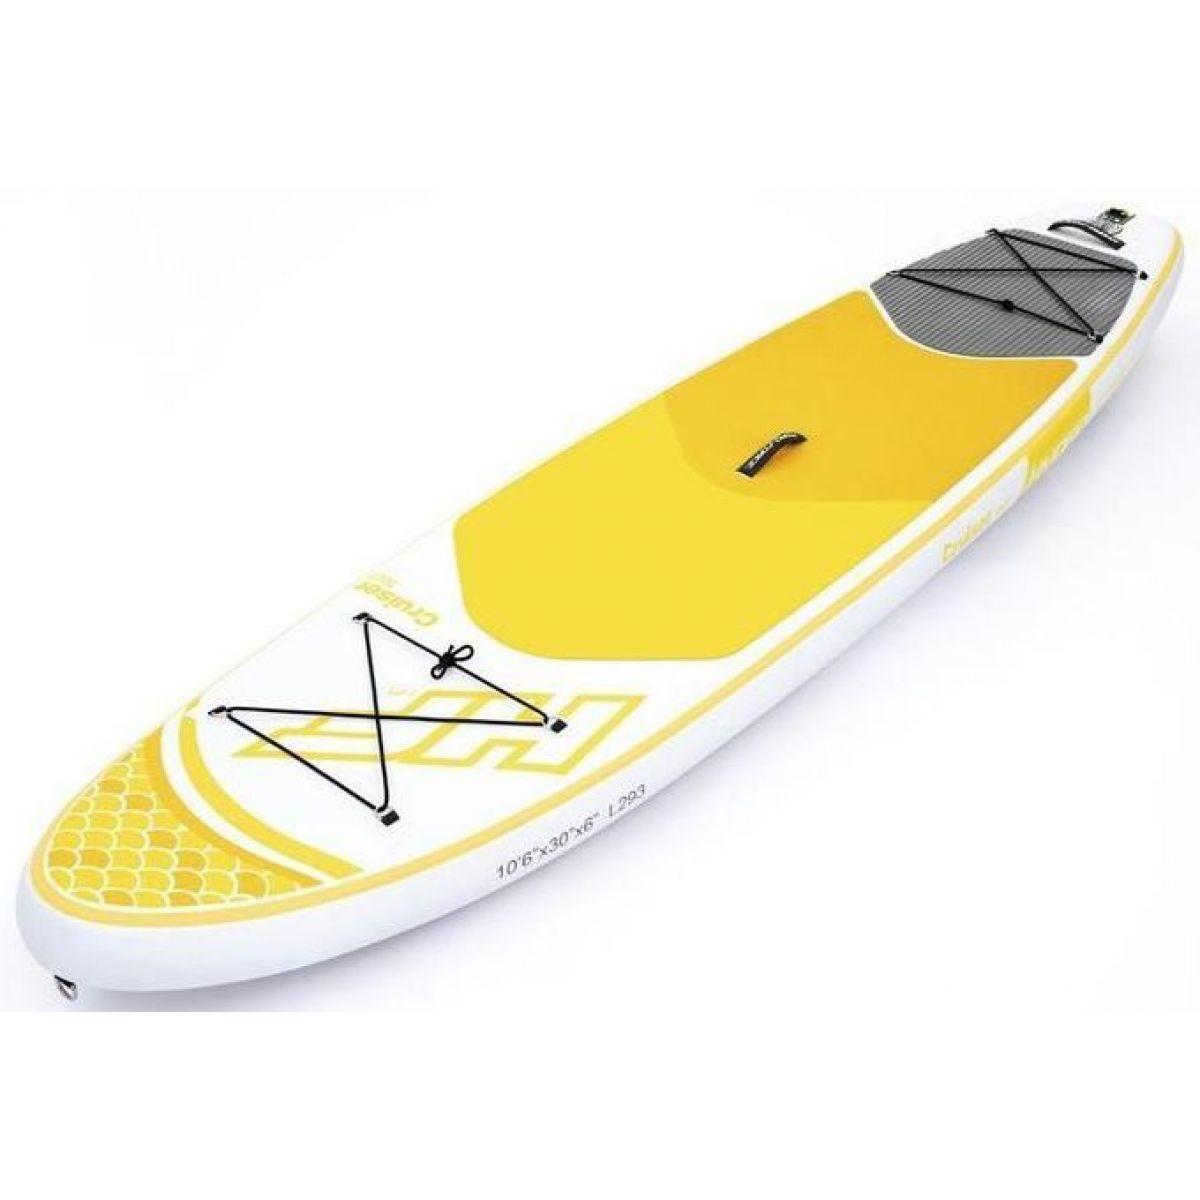 Paddleboard Bestway 65305 Cruiser Tech 320 x 76 x 15 cm